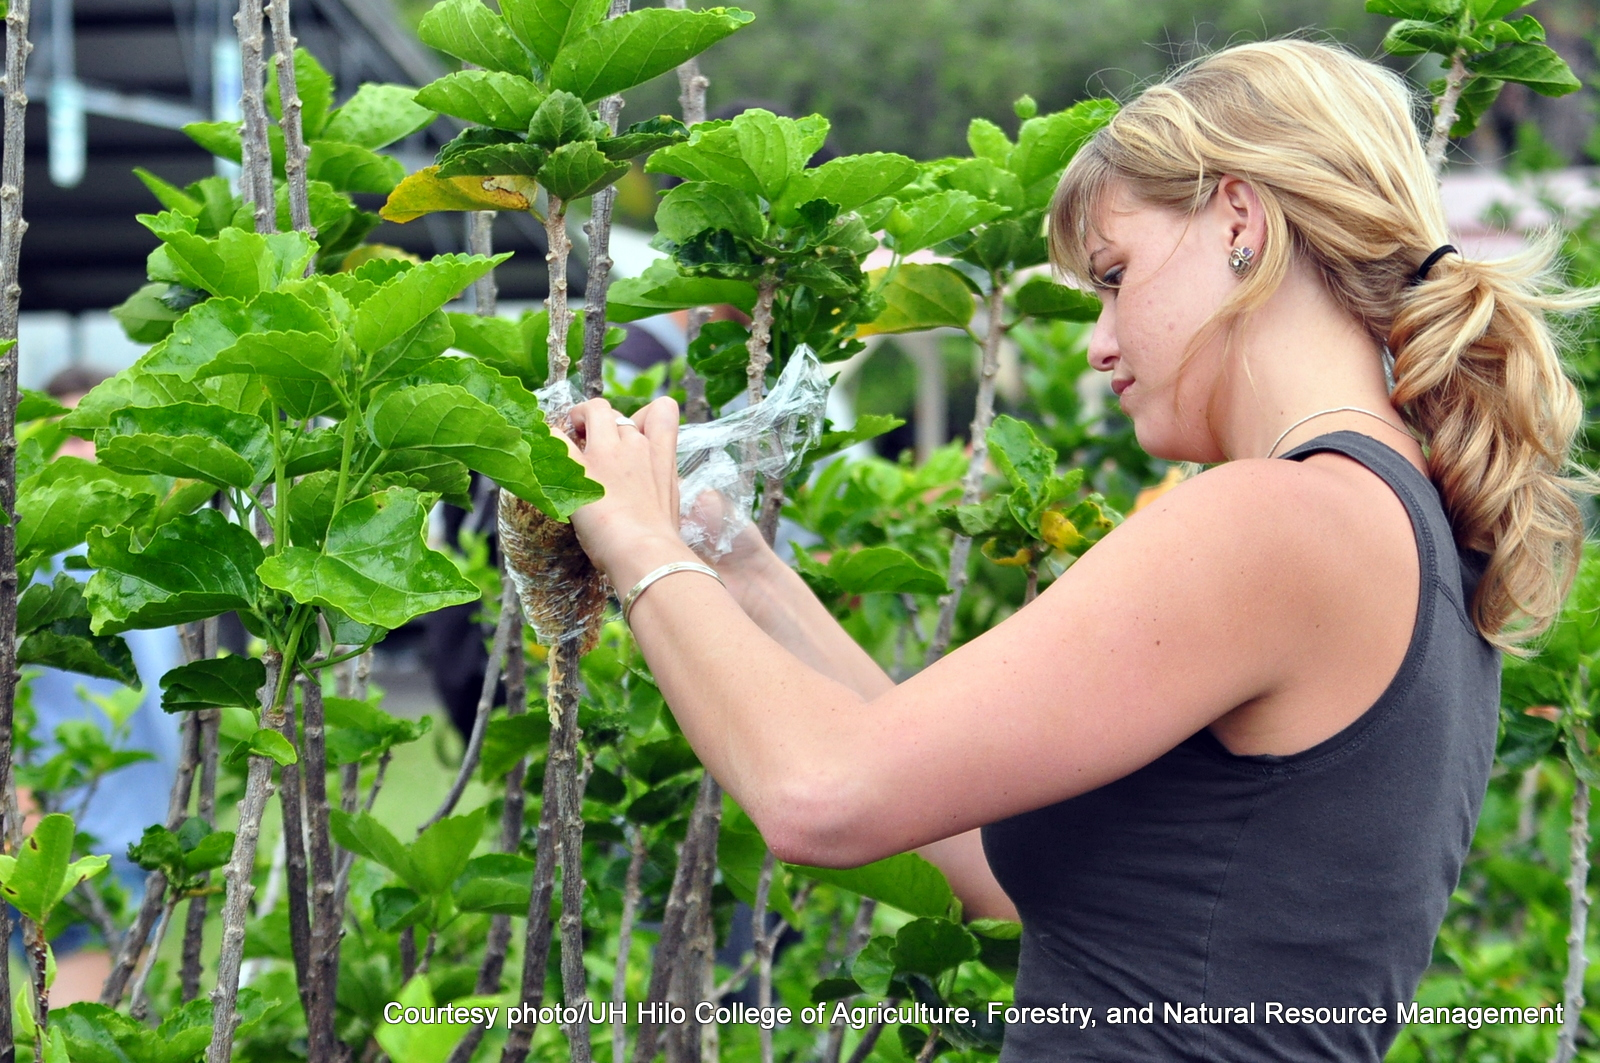 Maria McCarthy handling plants.